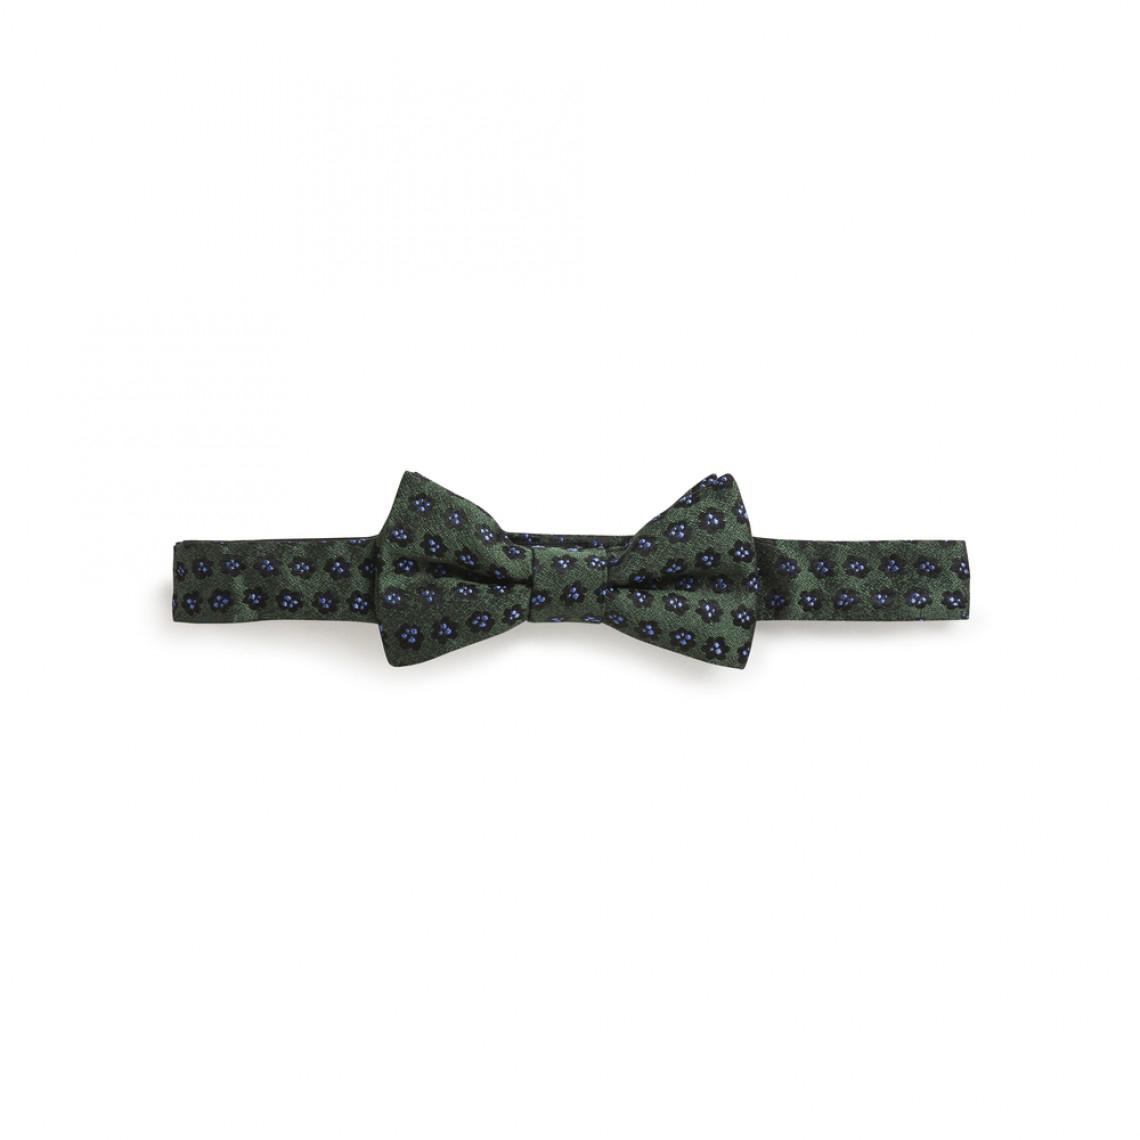 ring bearer dark green floral bow tie